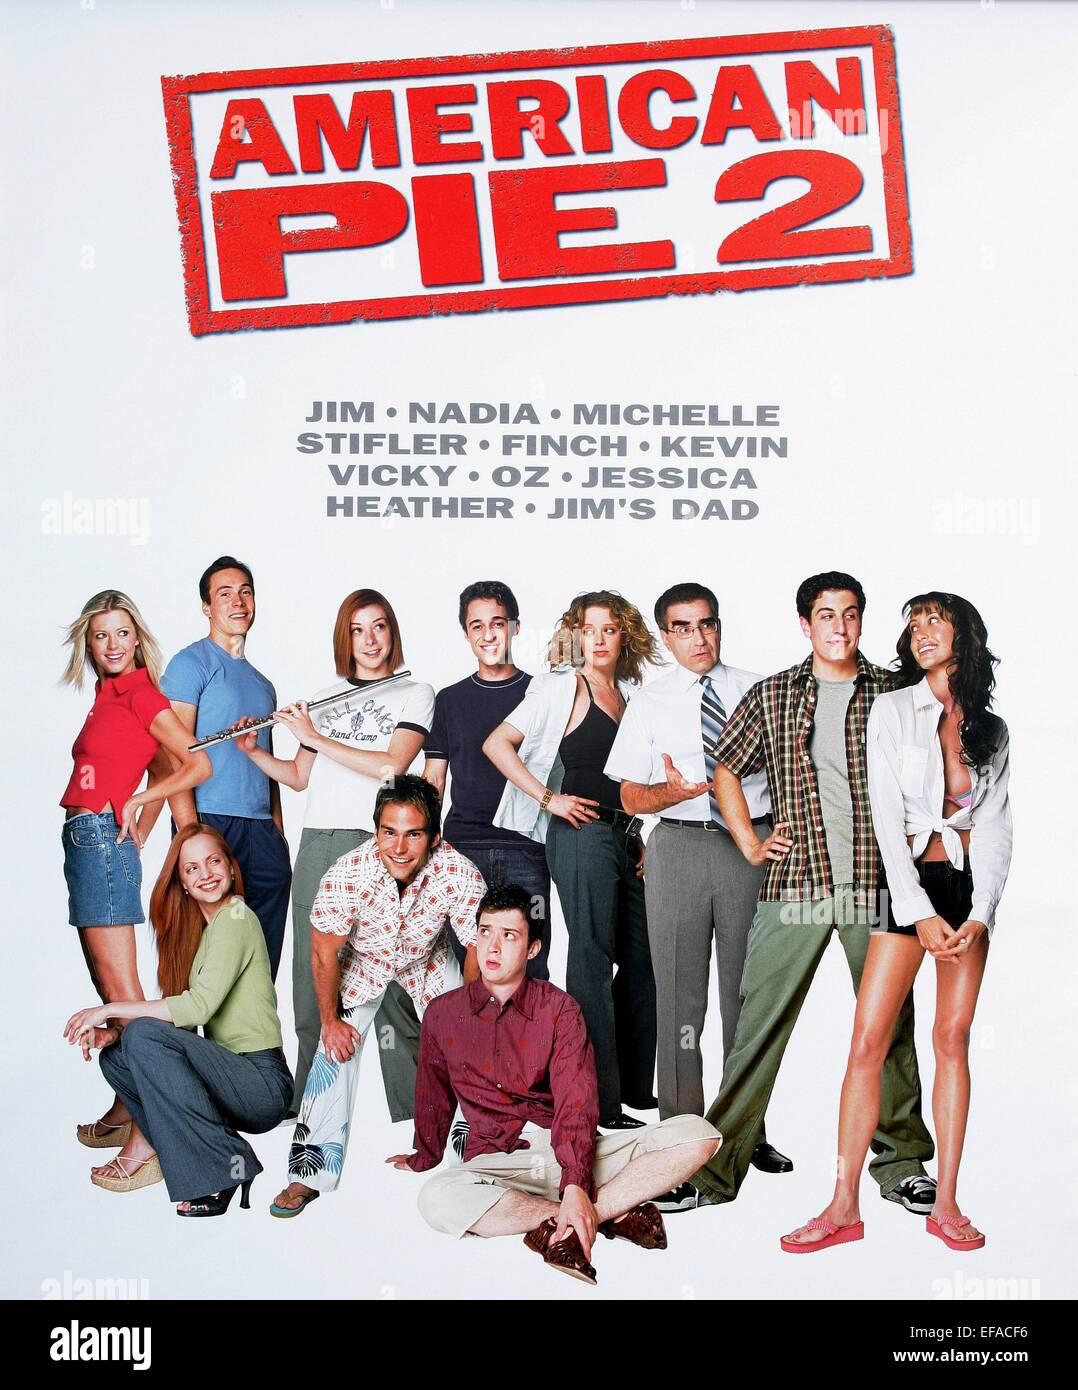 Film Poster American Pie 2 2001 Stock Photo Alamy